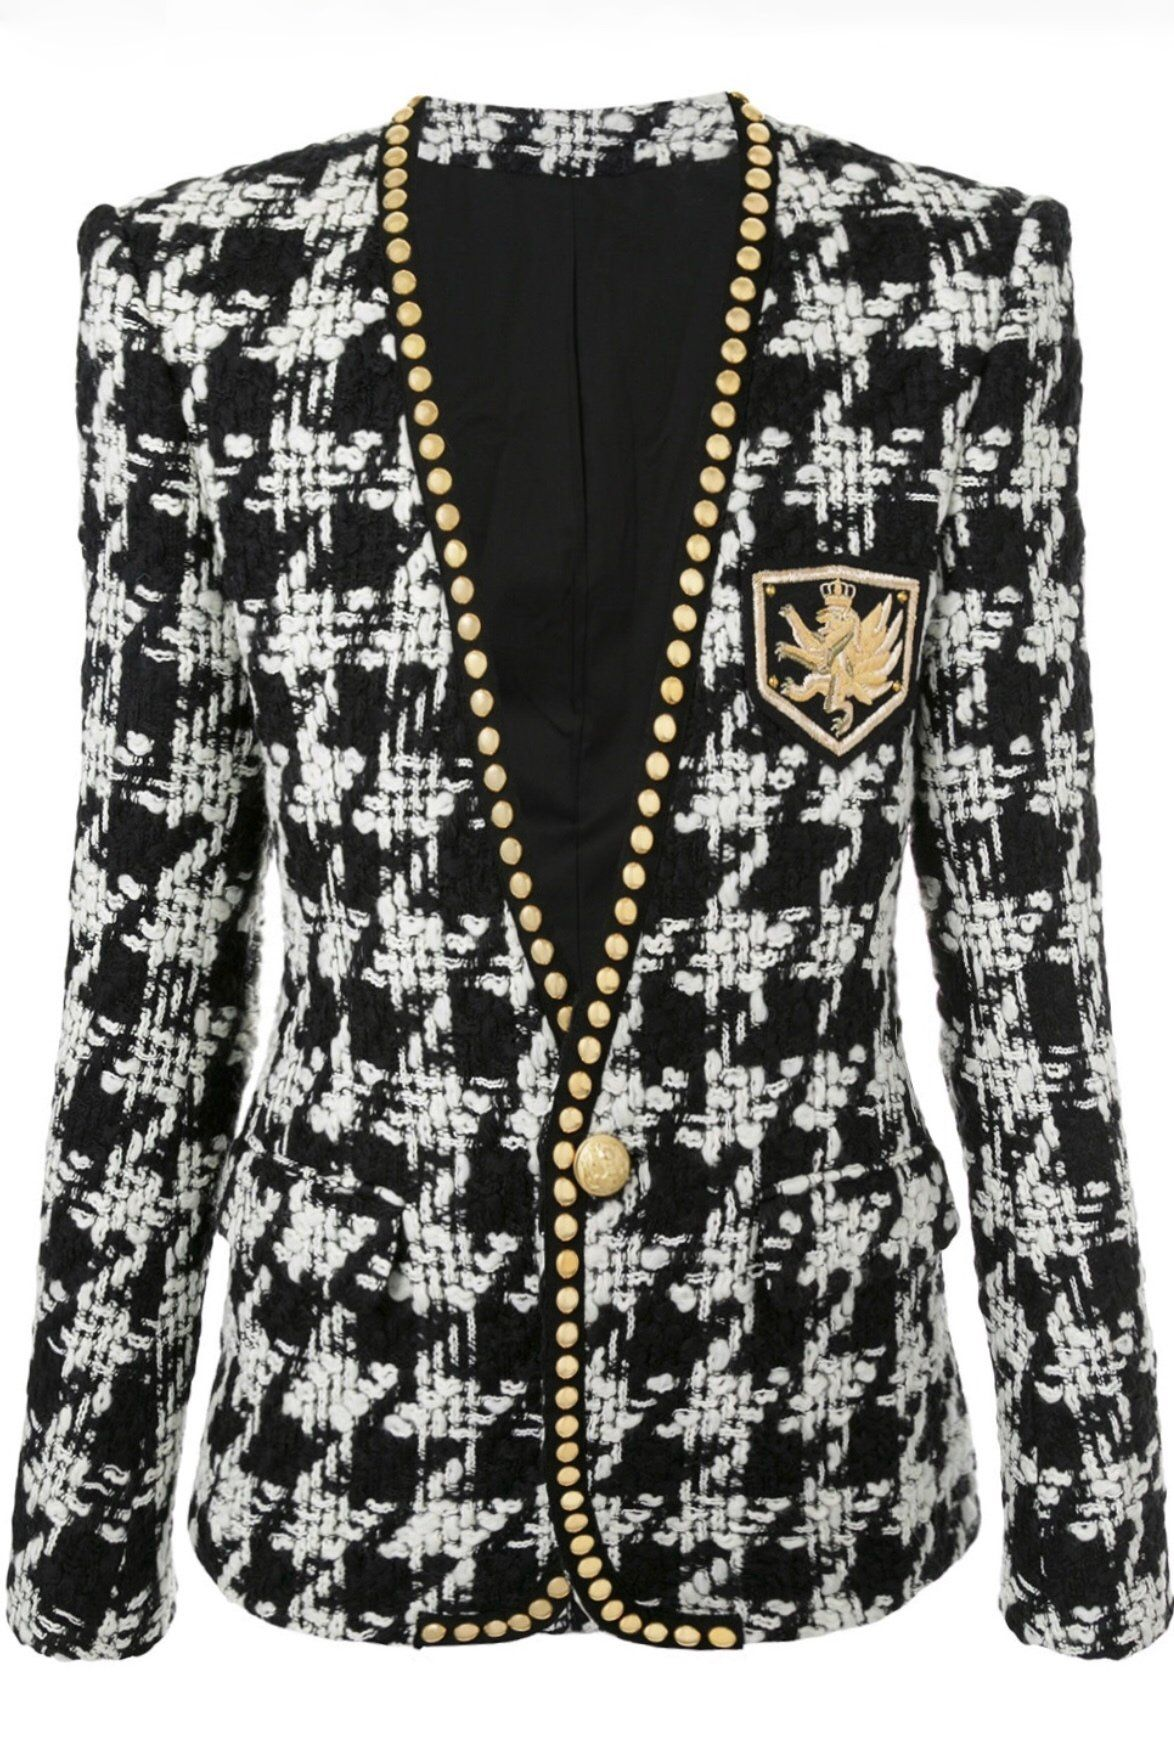 a8ba71fe3 Houndstooth Studded Blazer in 2019 | Clothes | Fashion, Balmain ...